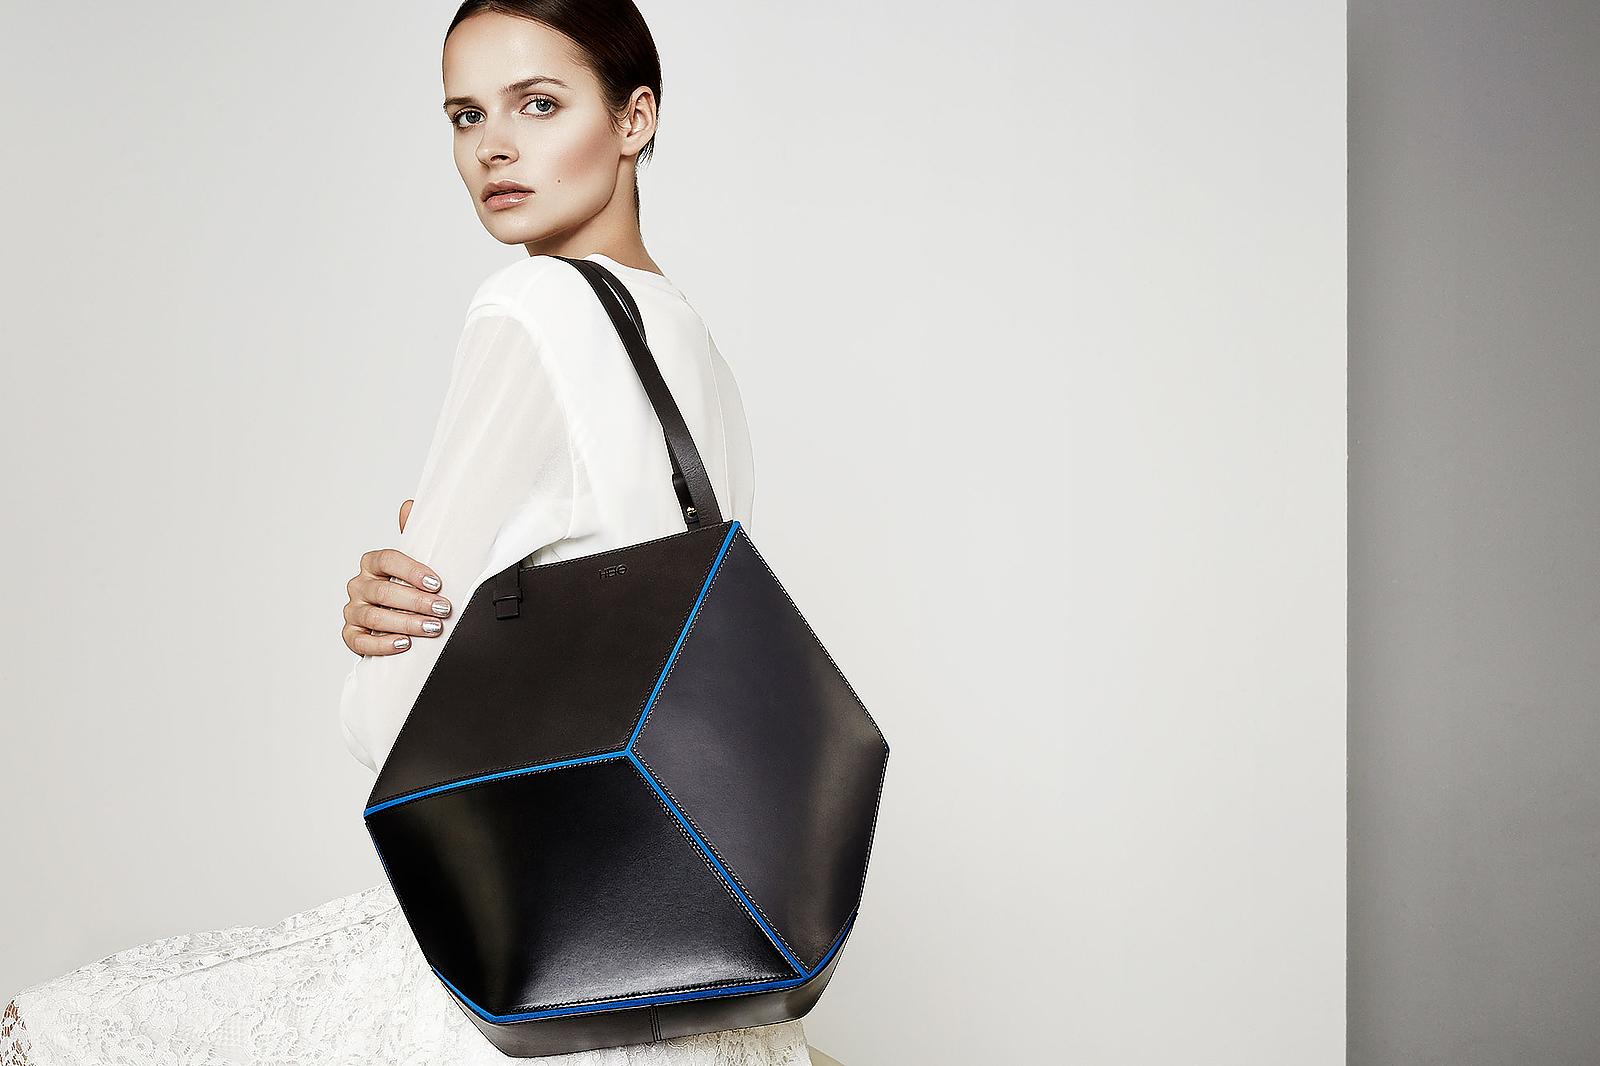 The Cube bag by HEIO